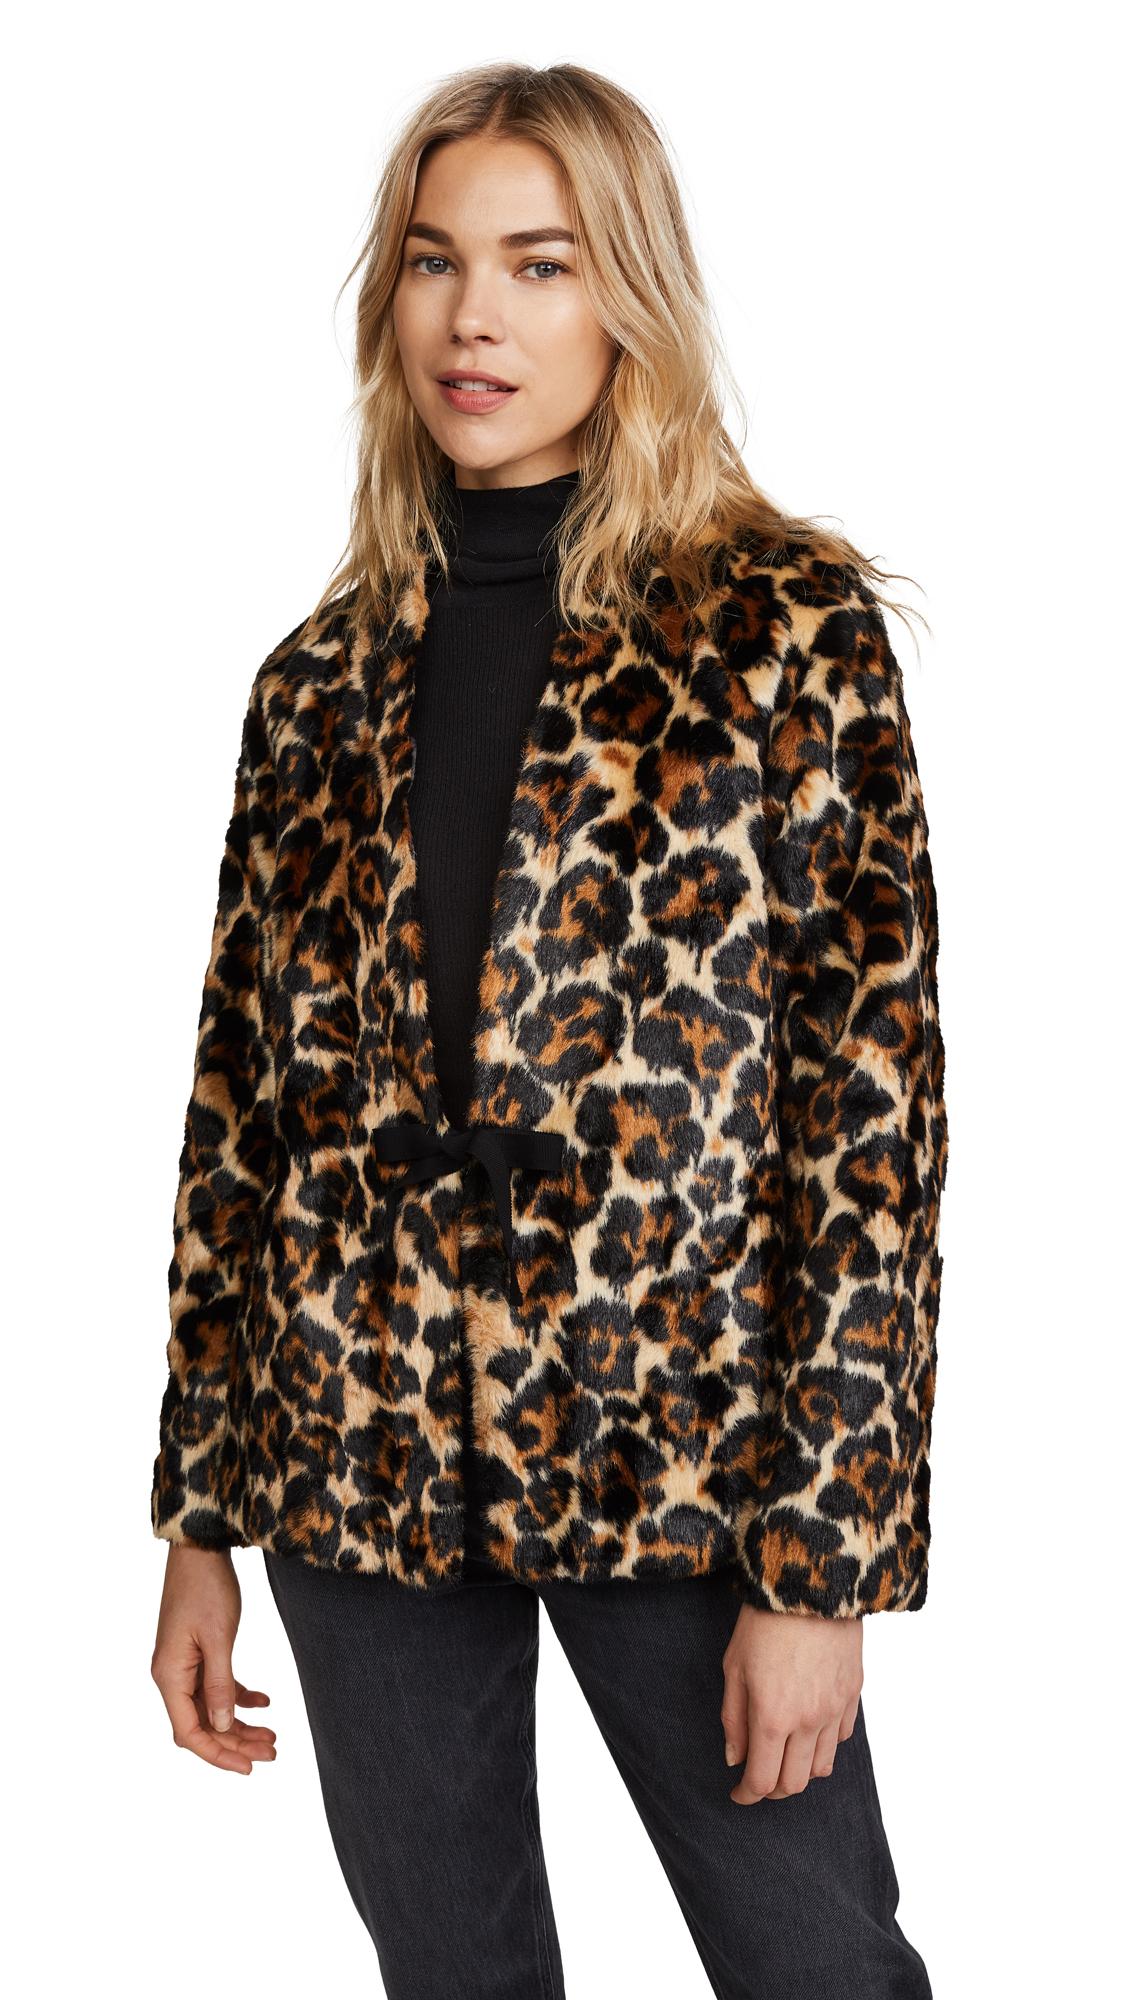 McQ - Alexander McQueen Short Leopard Coat